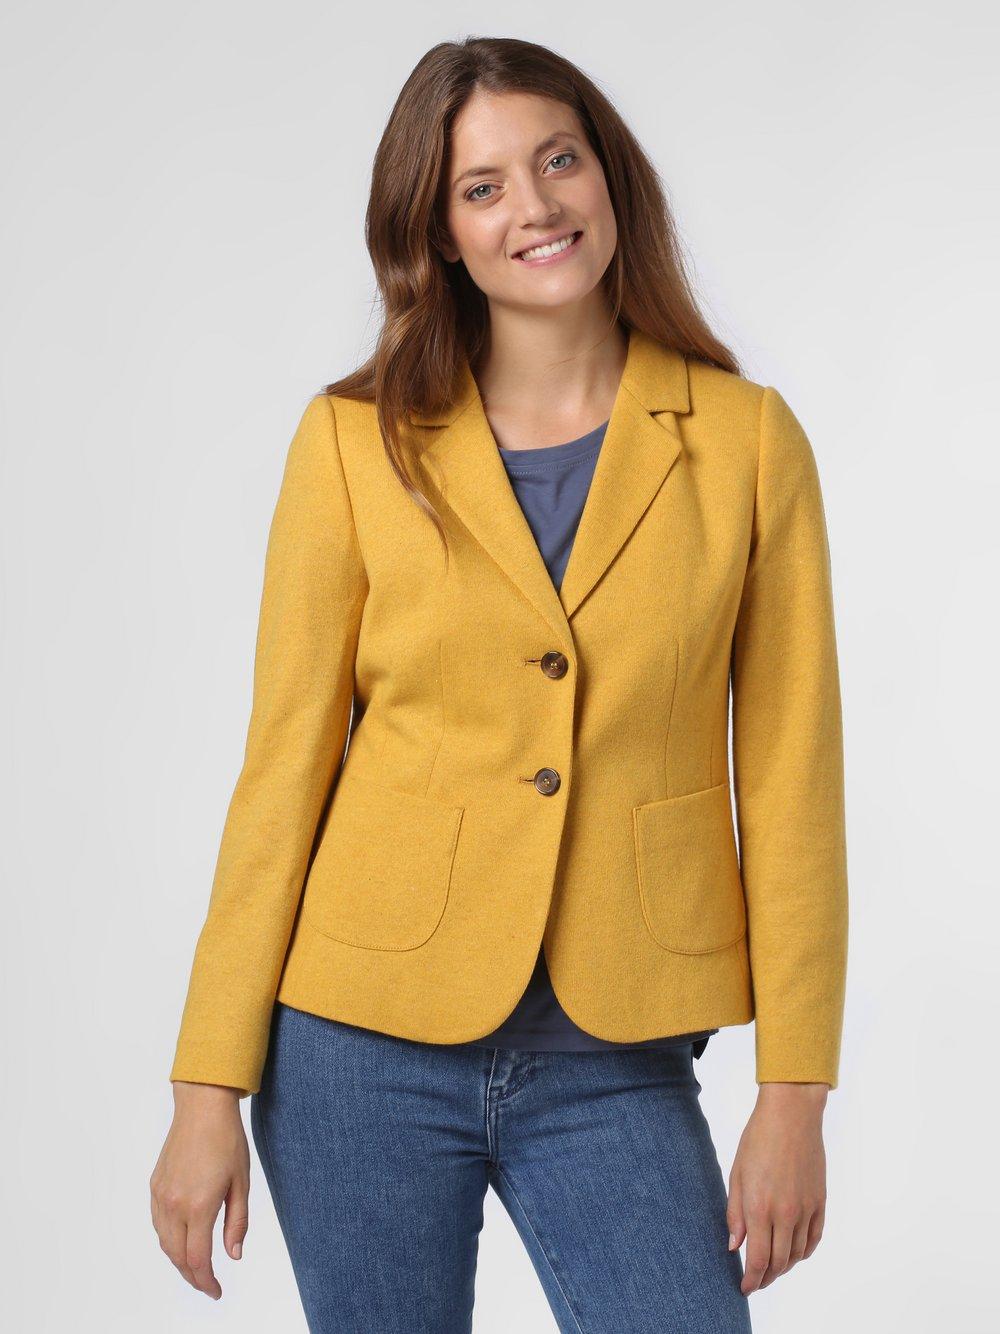 Betty Barclay – Blezer damski, żółty Van Graaf 488866-0001